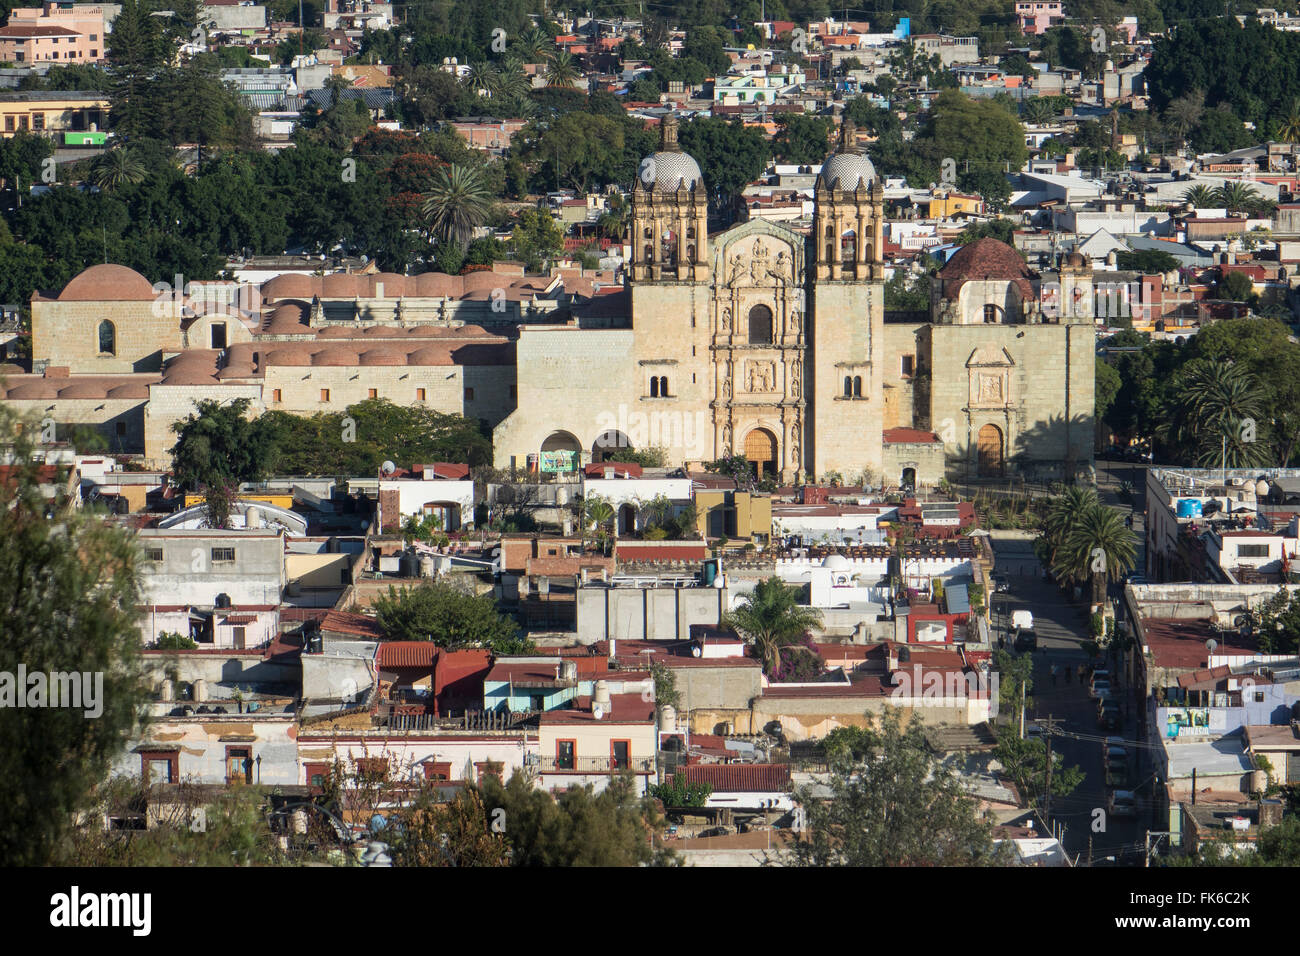 Aerial view of city and Santo Domingo church, Oaxaca, Mexico, North America - Stock Image